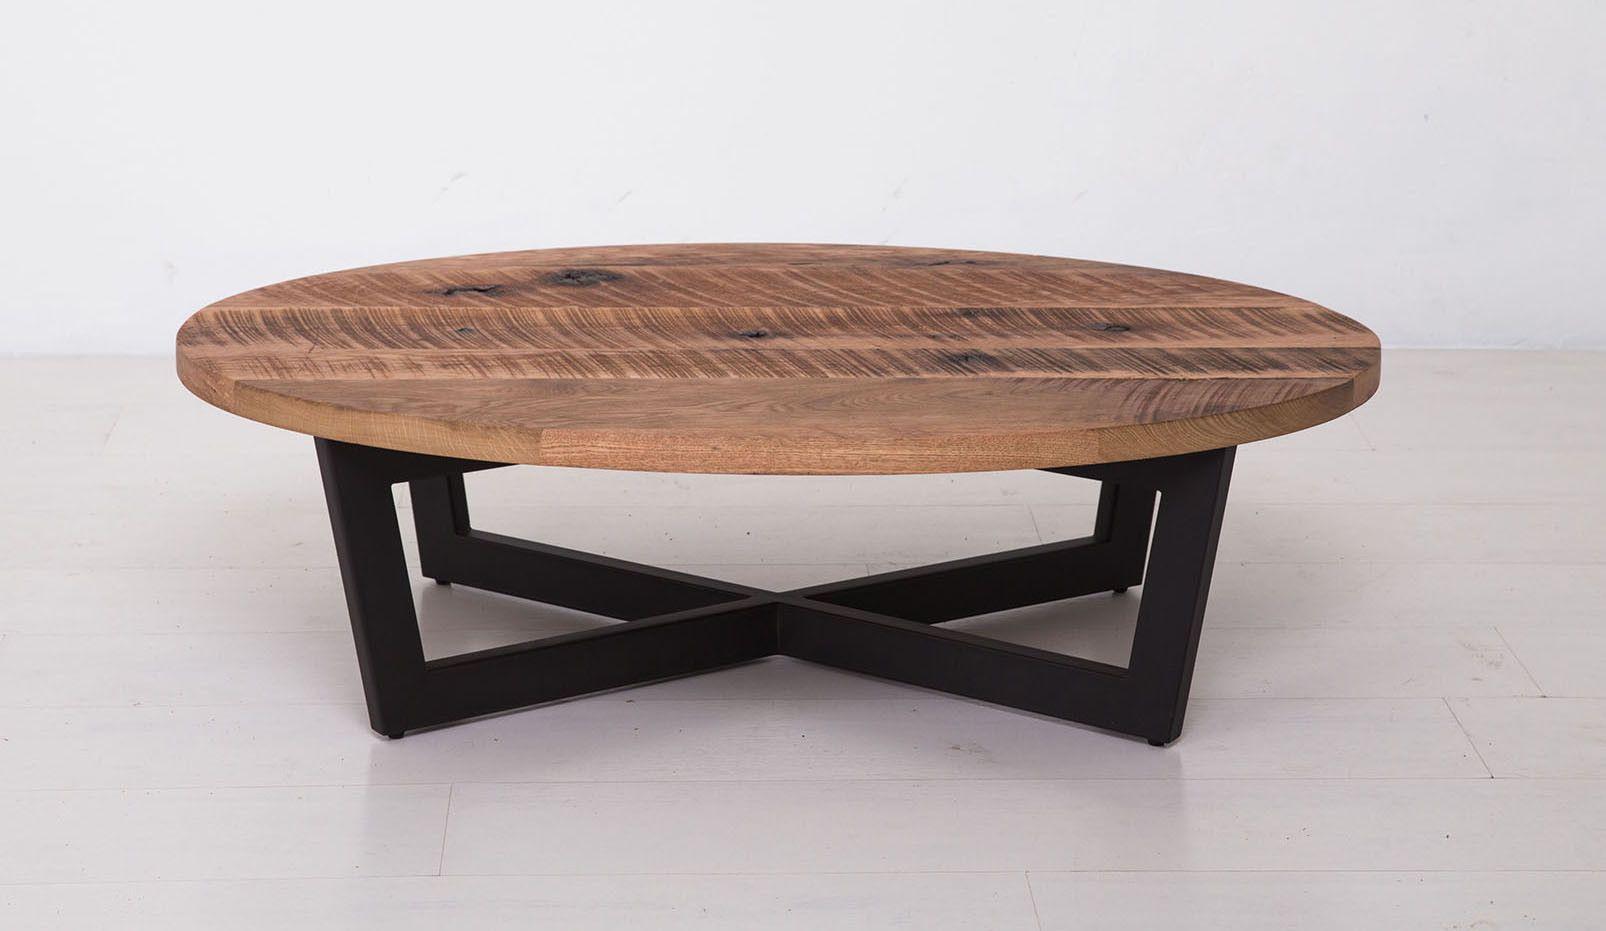 Risom Amoeba Shaped Coffee Table Coffee Table Contemporary Coffee Table Oval Coffee Tables [ 931 x 1606 Pixel ]